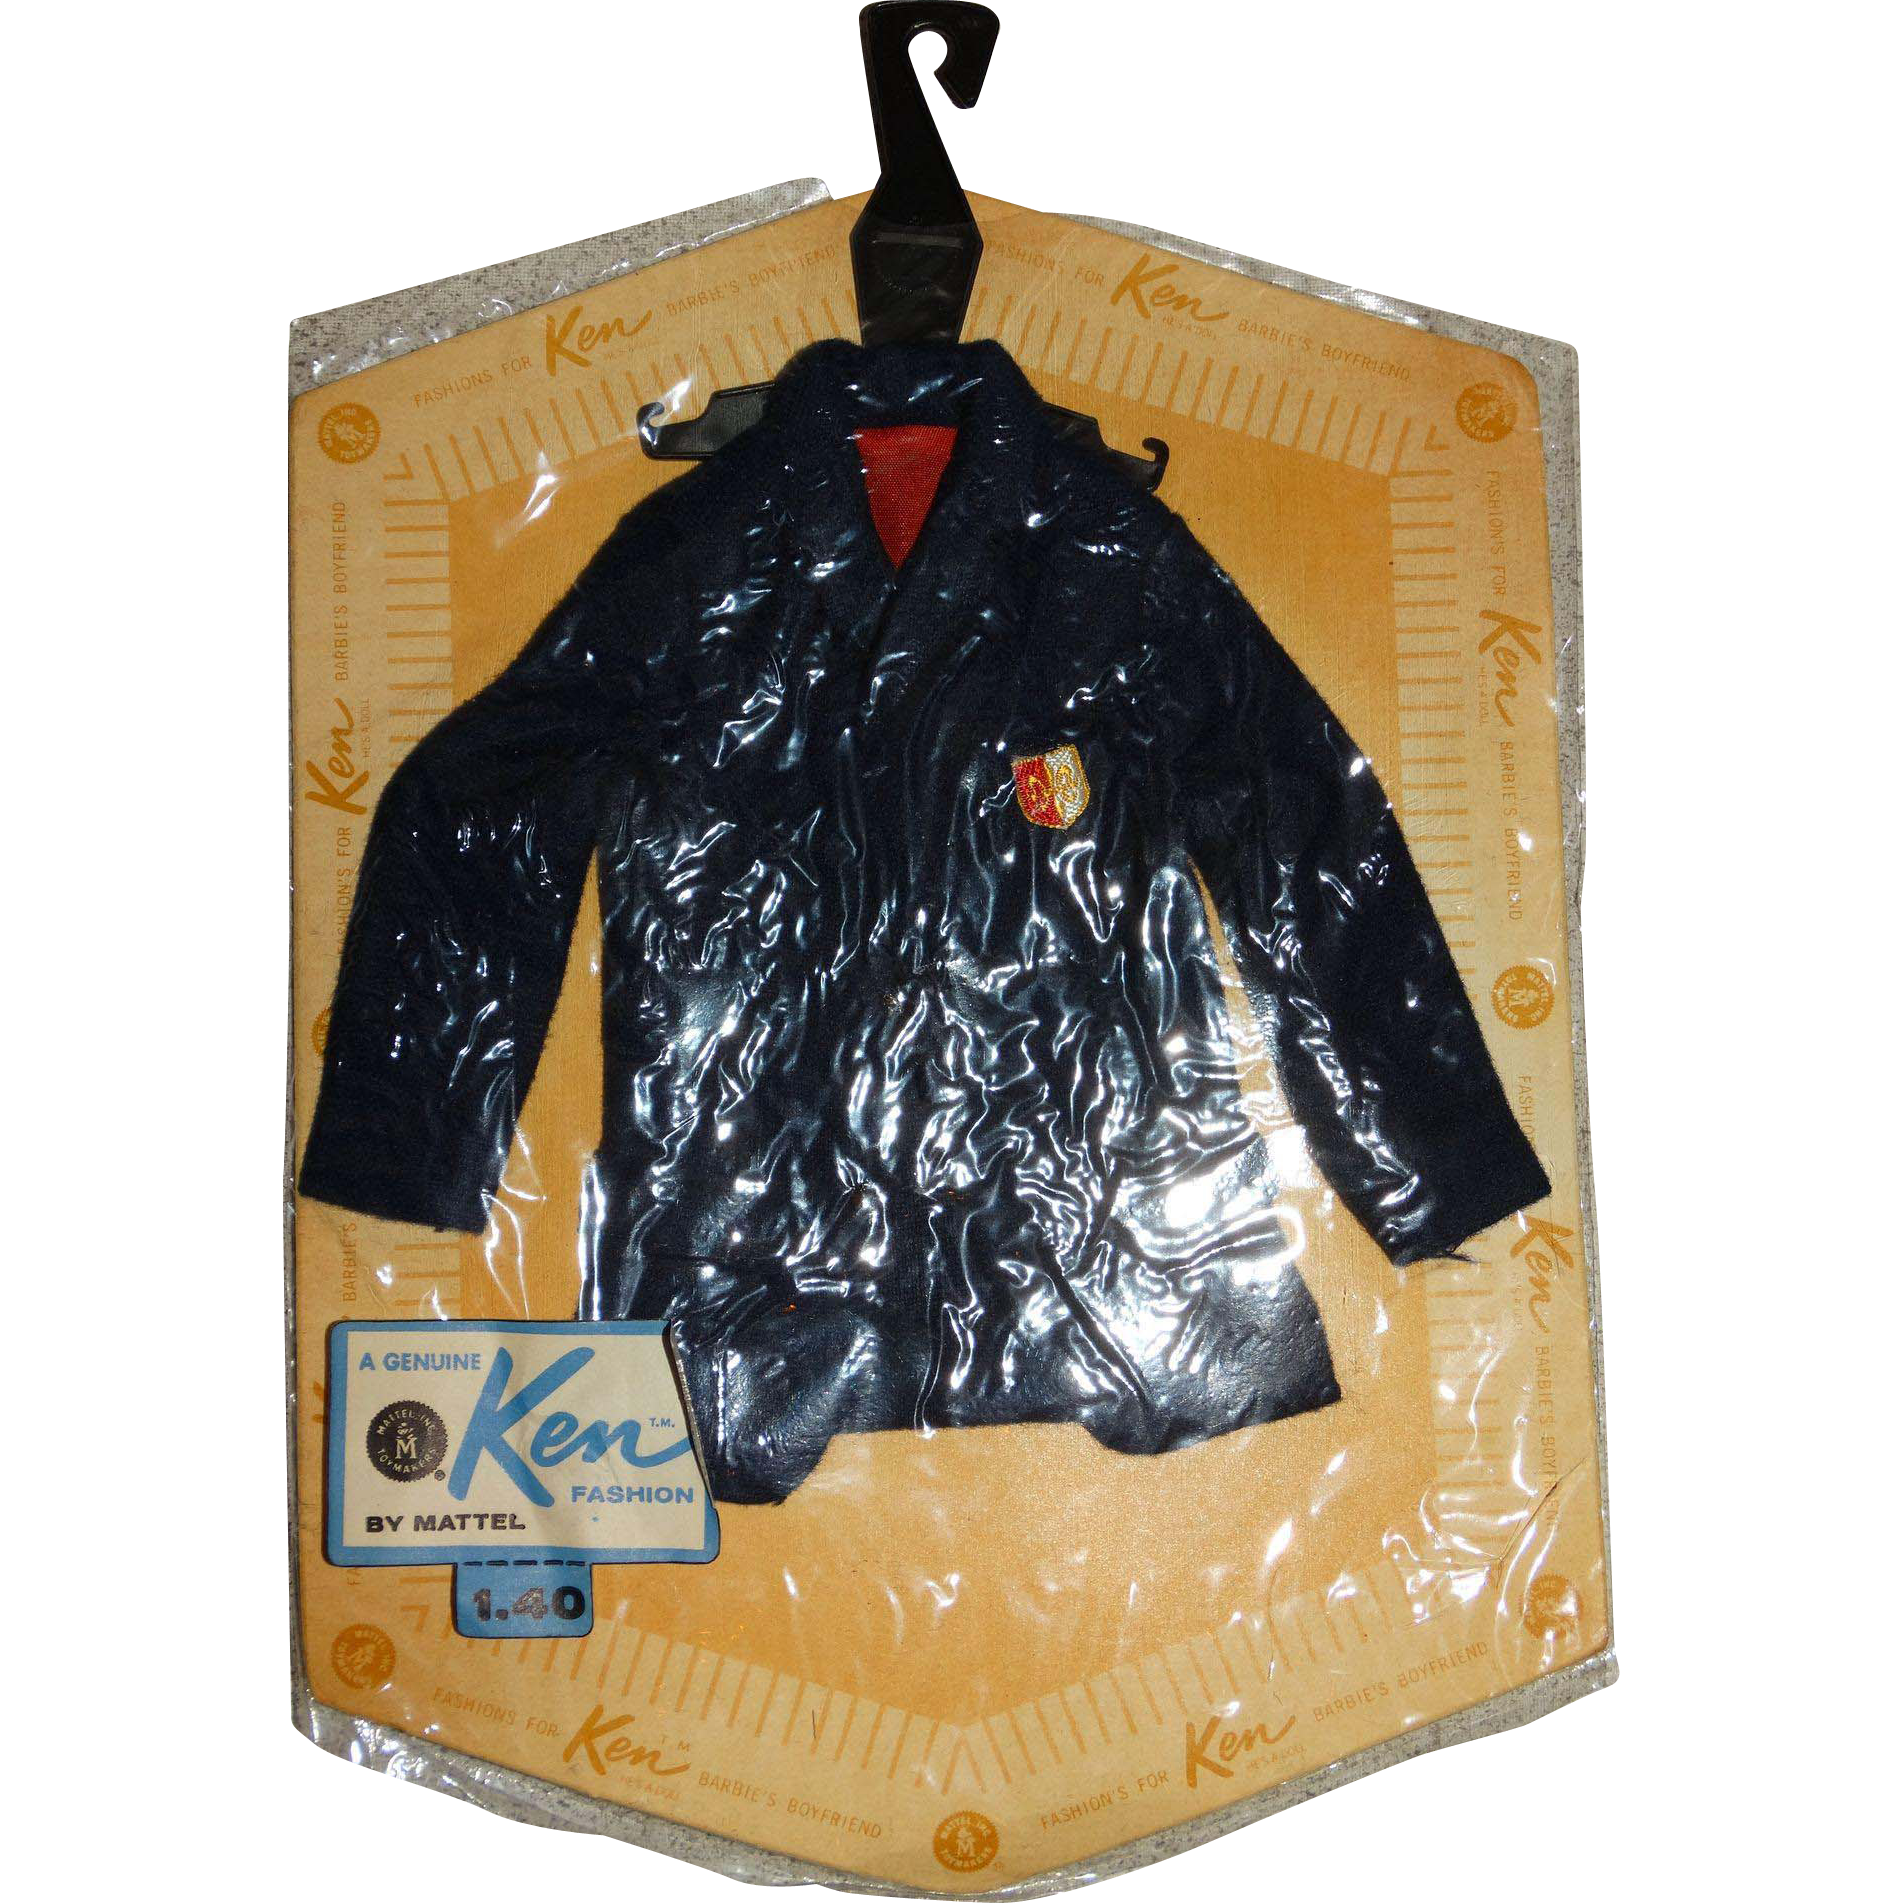 Vintage NRFP Ken PAK Blue Blazer